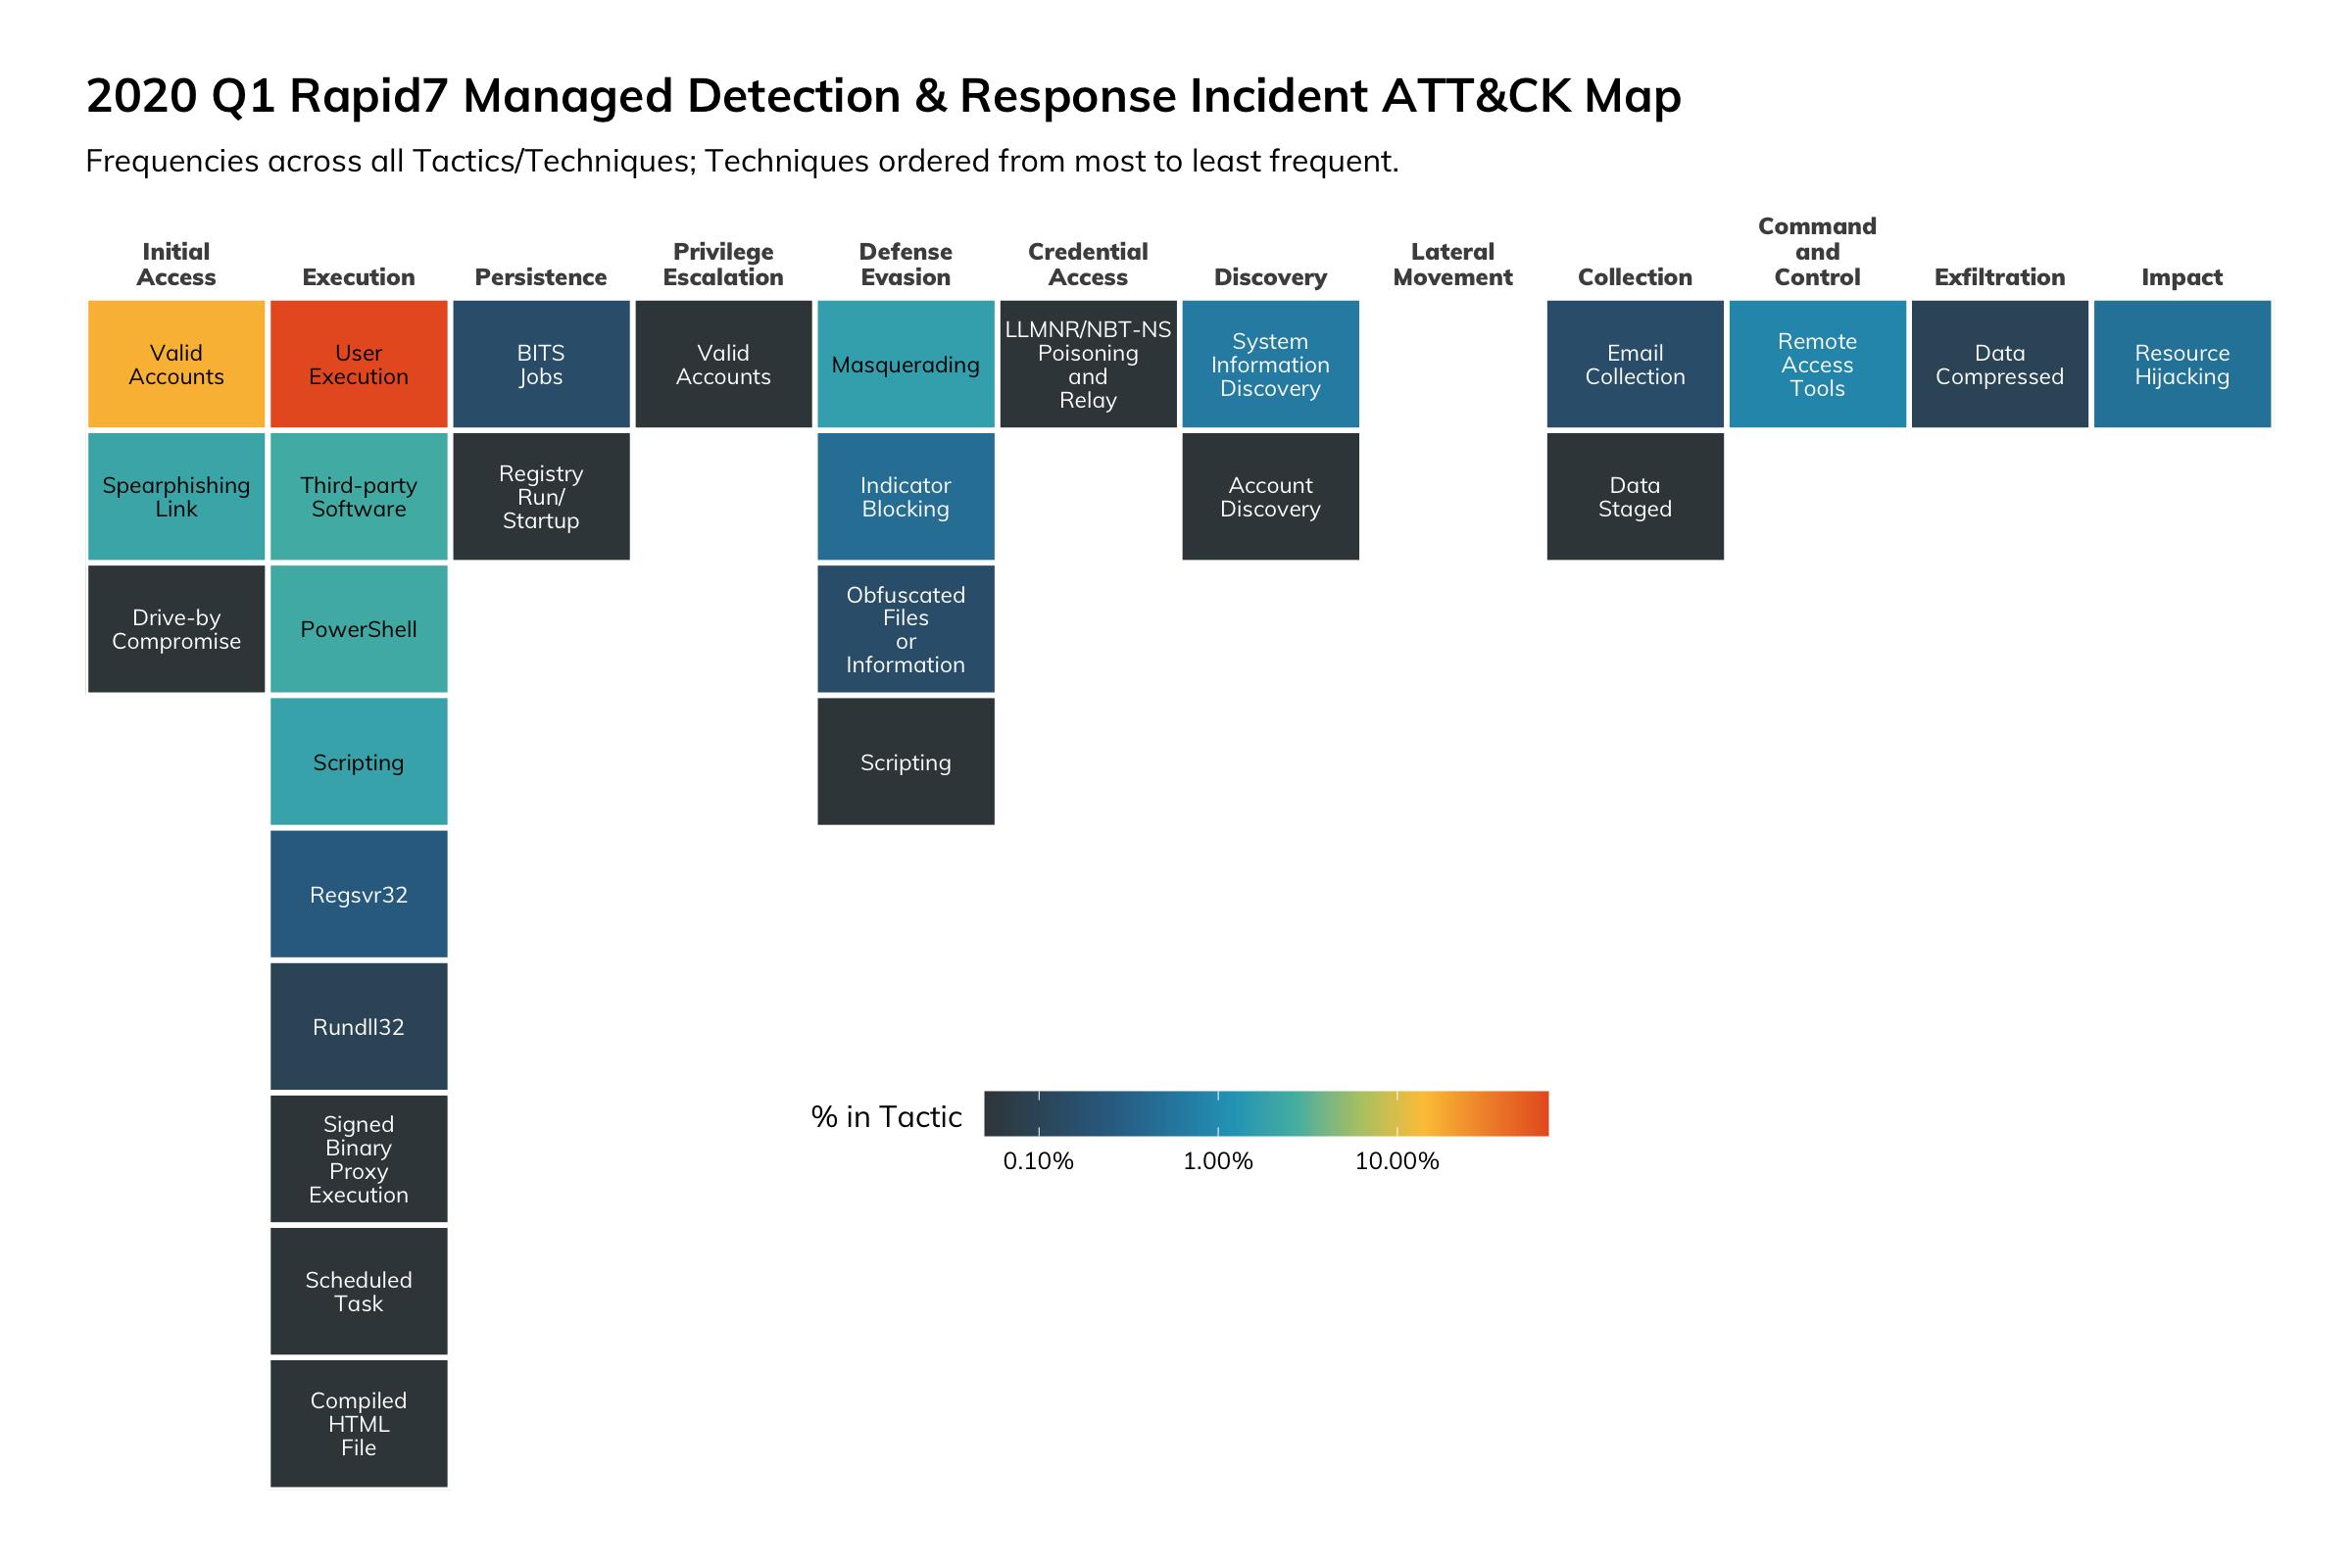 Figure 9: 2020 Q1 Rapid7 Managed Detection & Response Incident ATT&CK Map